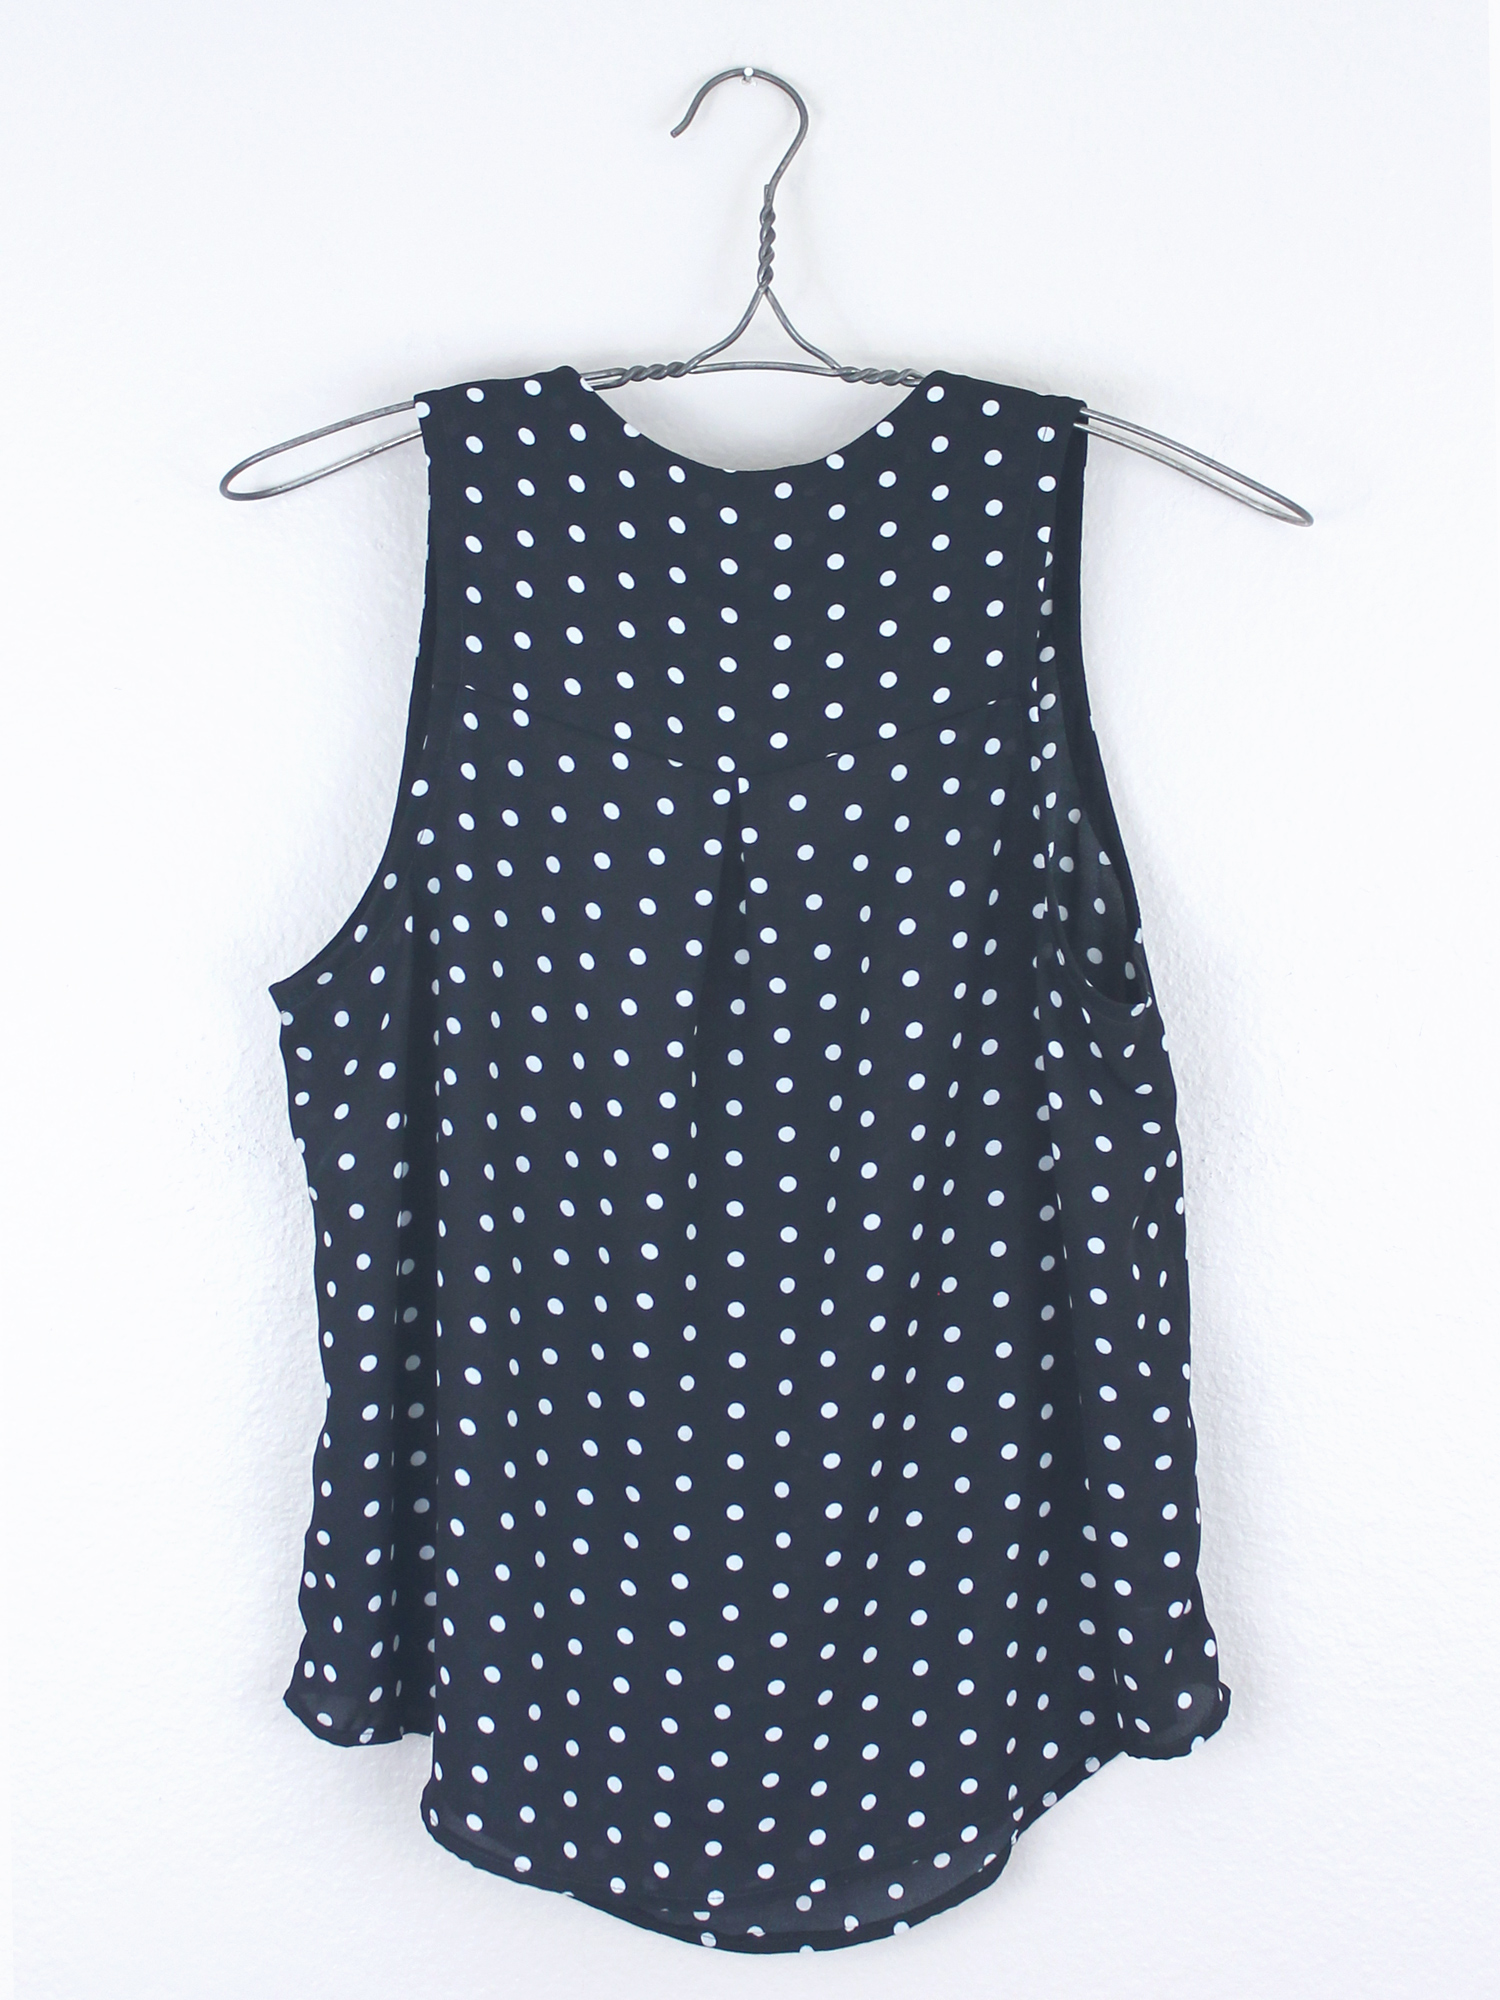 DIY Polka Dot Tank   Sew DIY